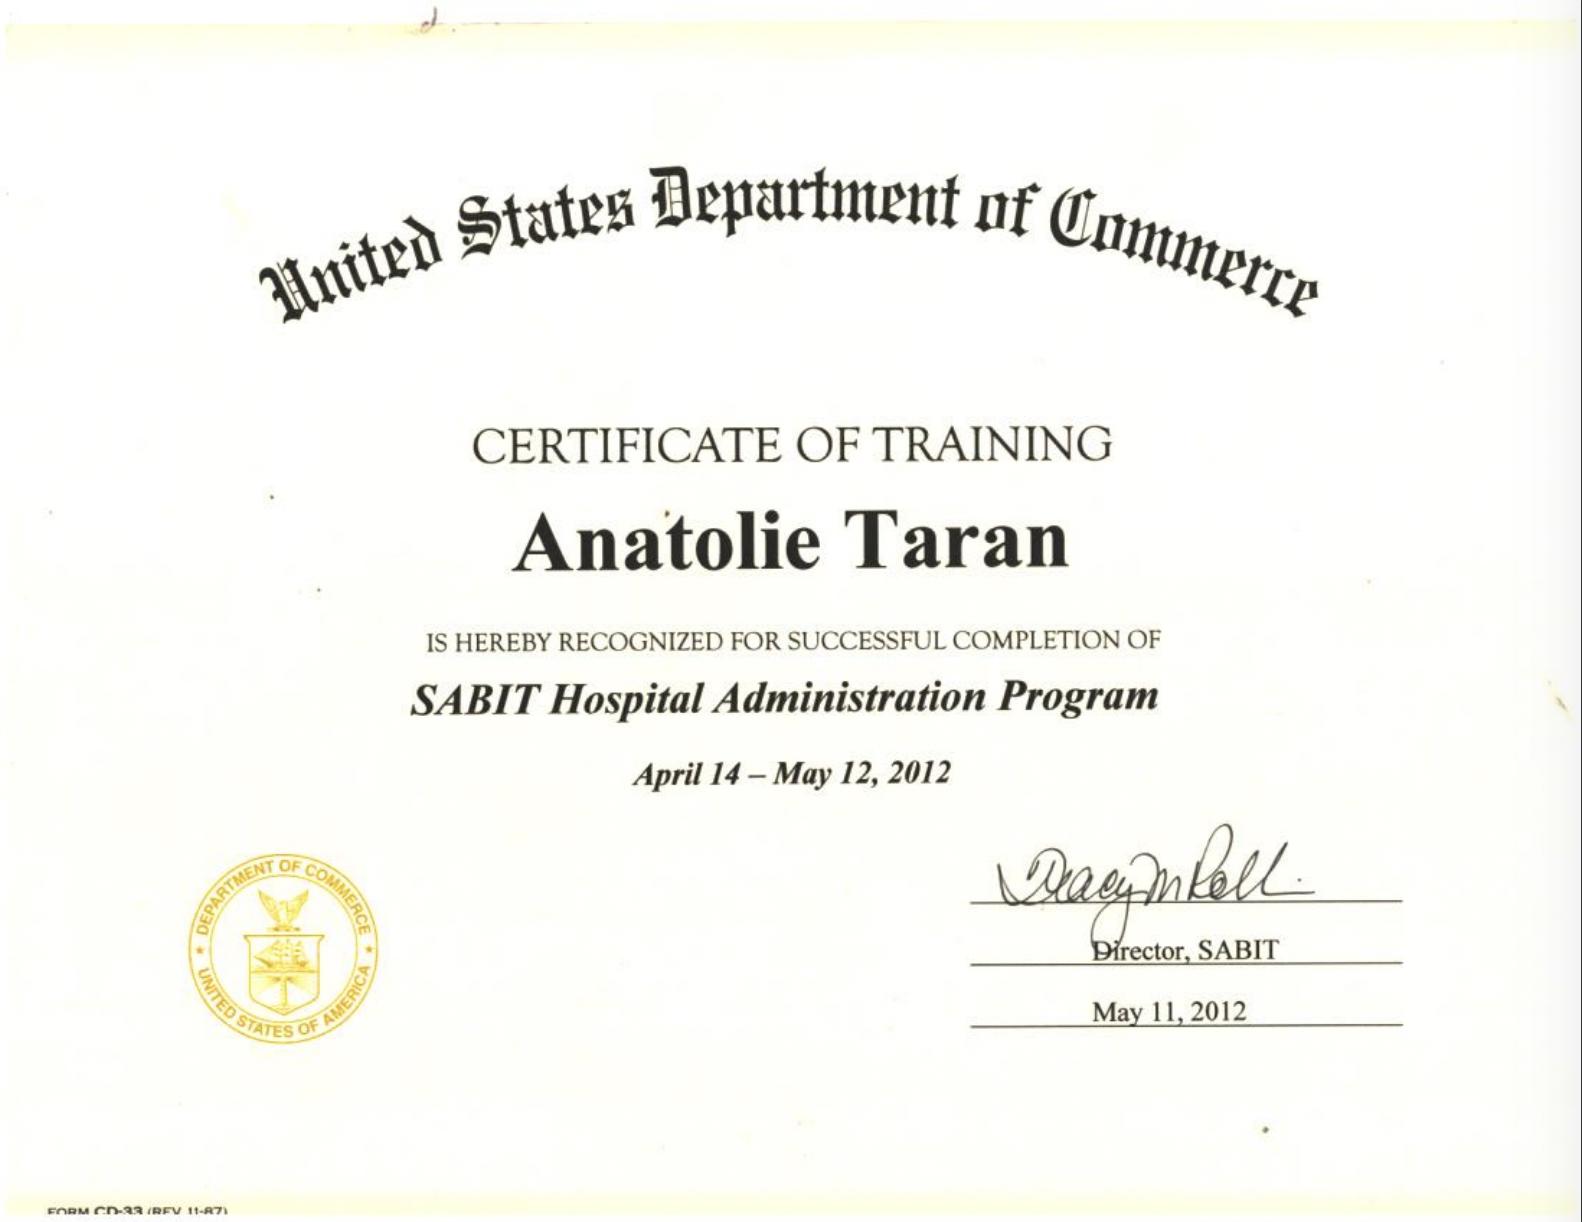 certificat SABIT Hospital Administration Program